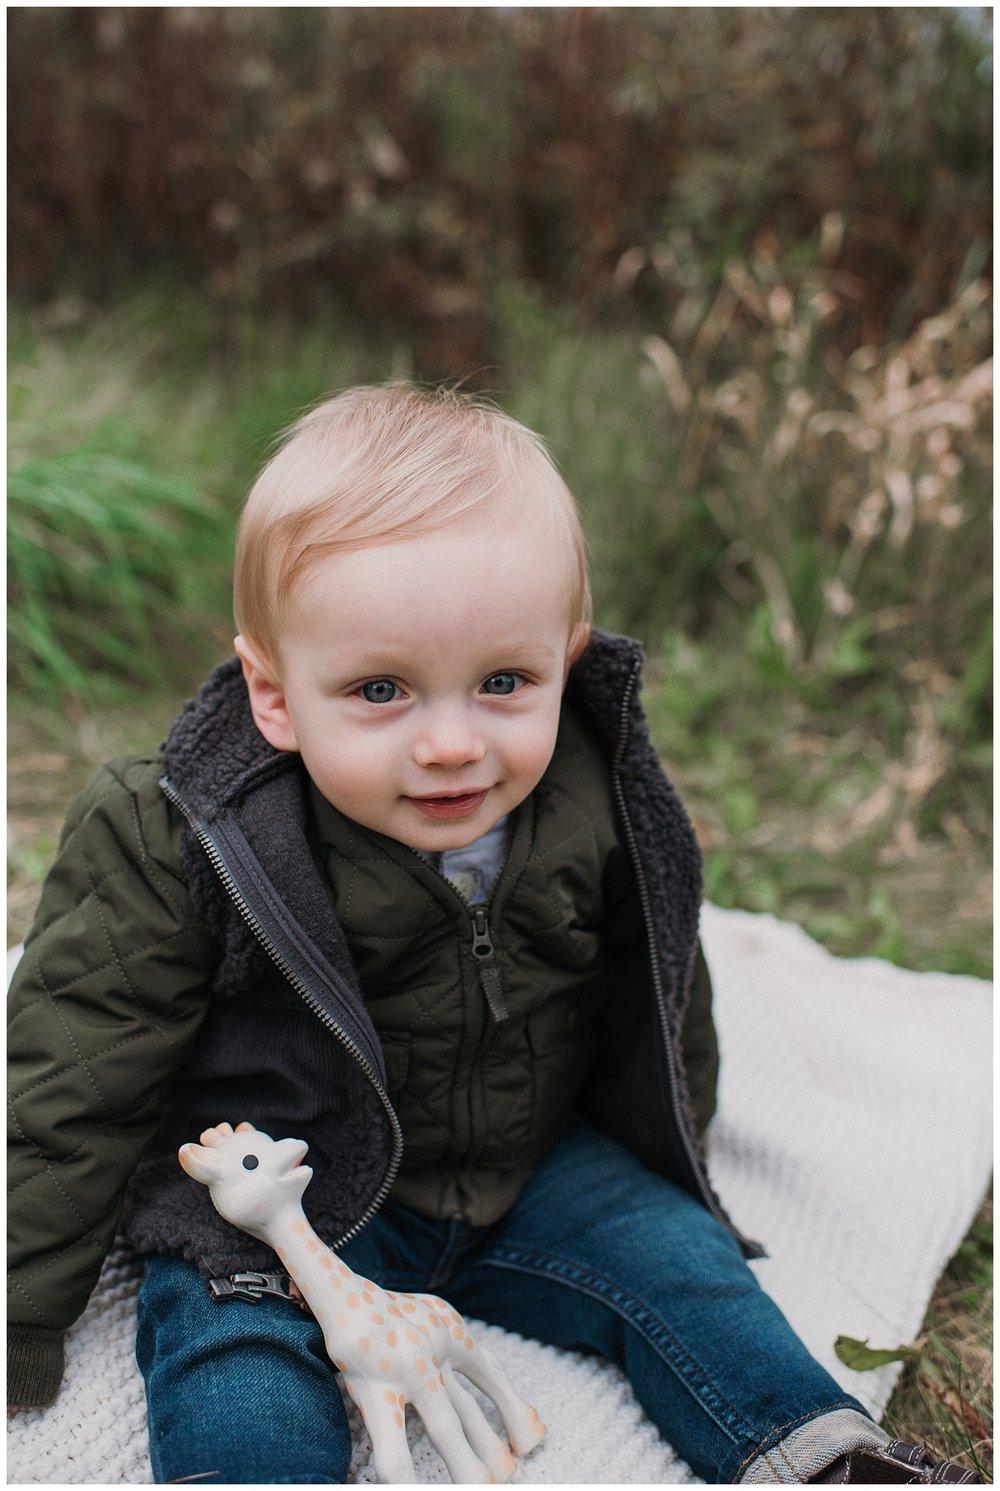 Wisconsin-family-photographer-2019 (6).jpg